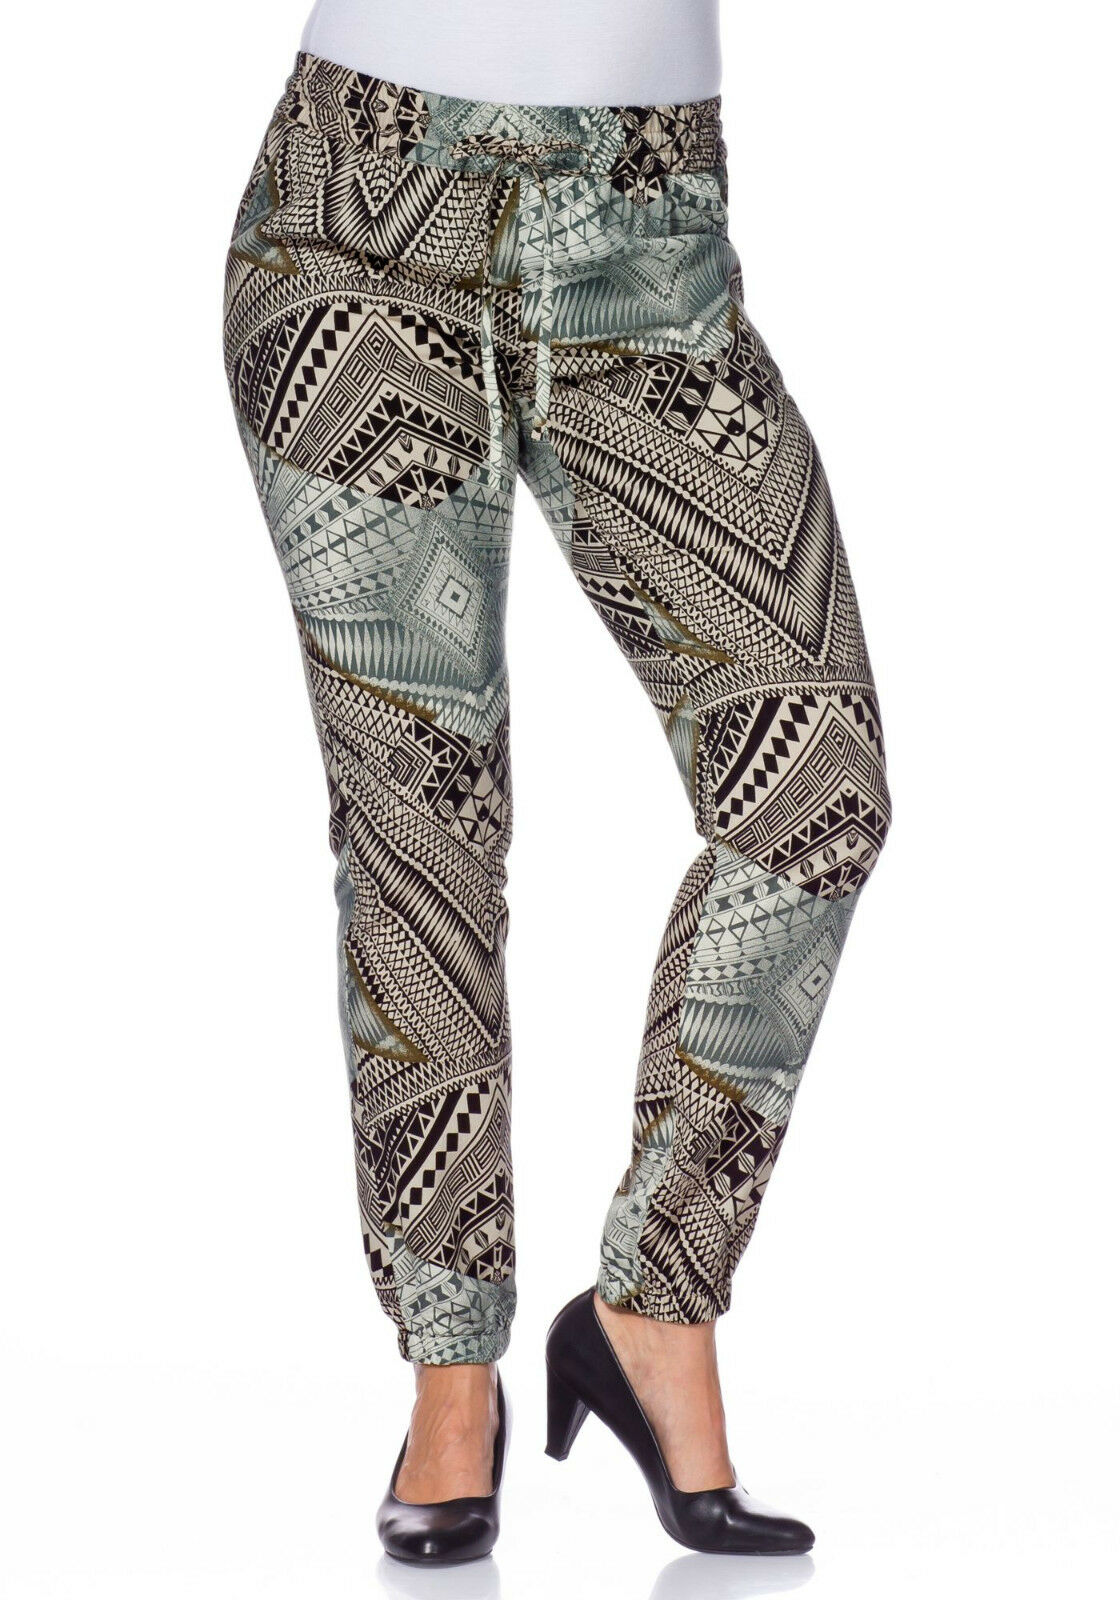 KP 59,99 € SALE/%/%/% taupe Lang-Gr NEU!! sheego Style Modische Hose